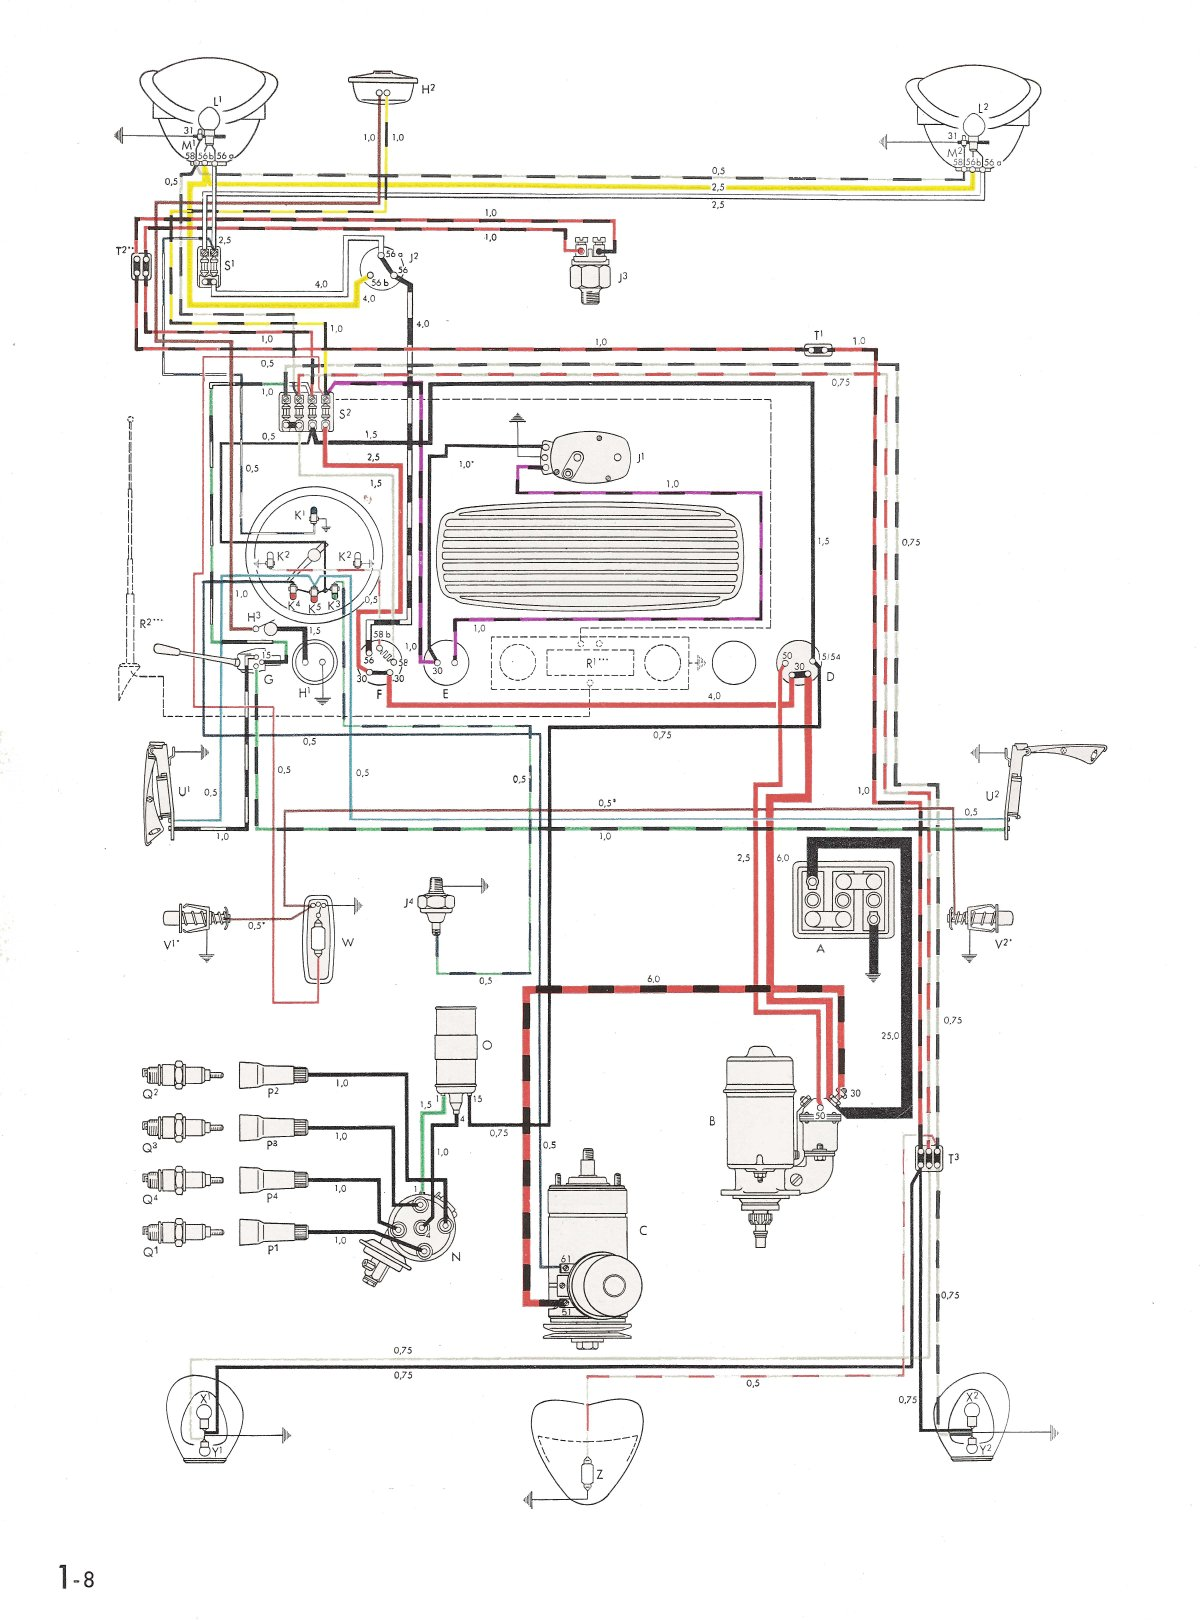 Jazzy 1170 Wiring Diagram | Wiring Liry on